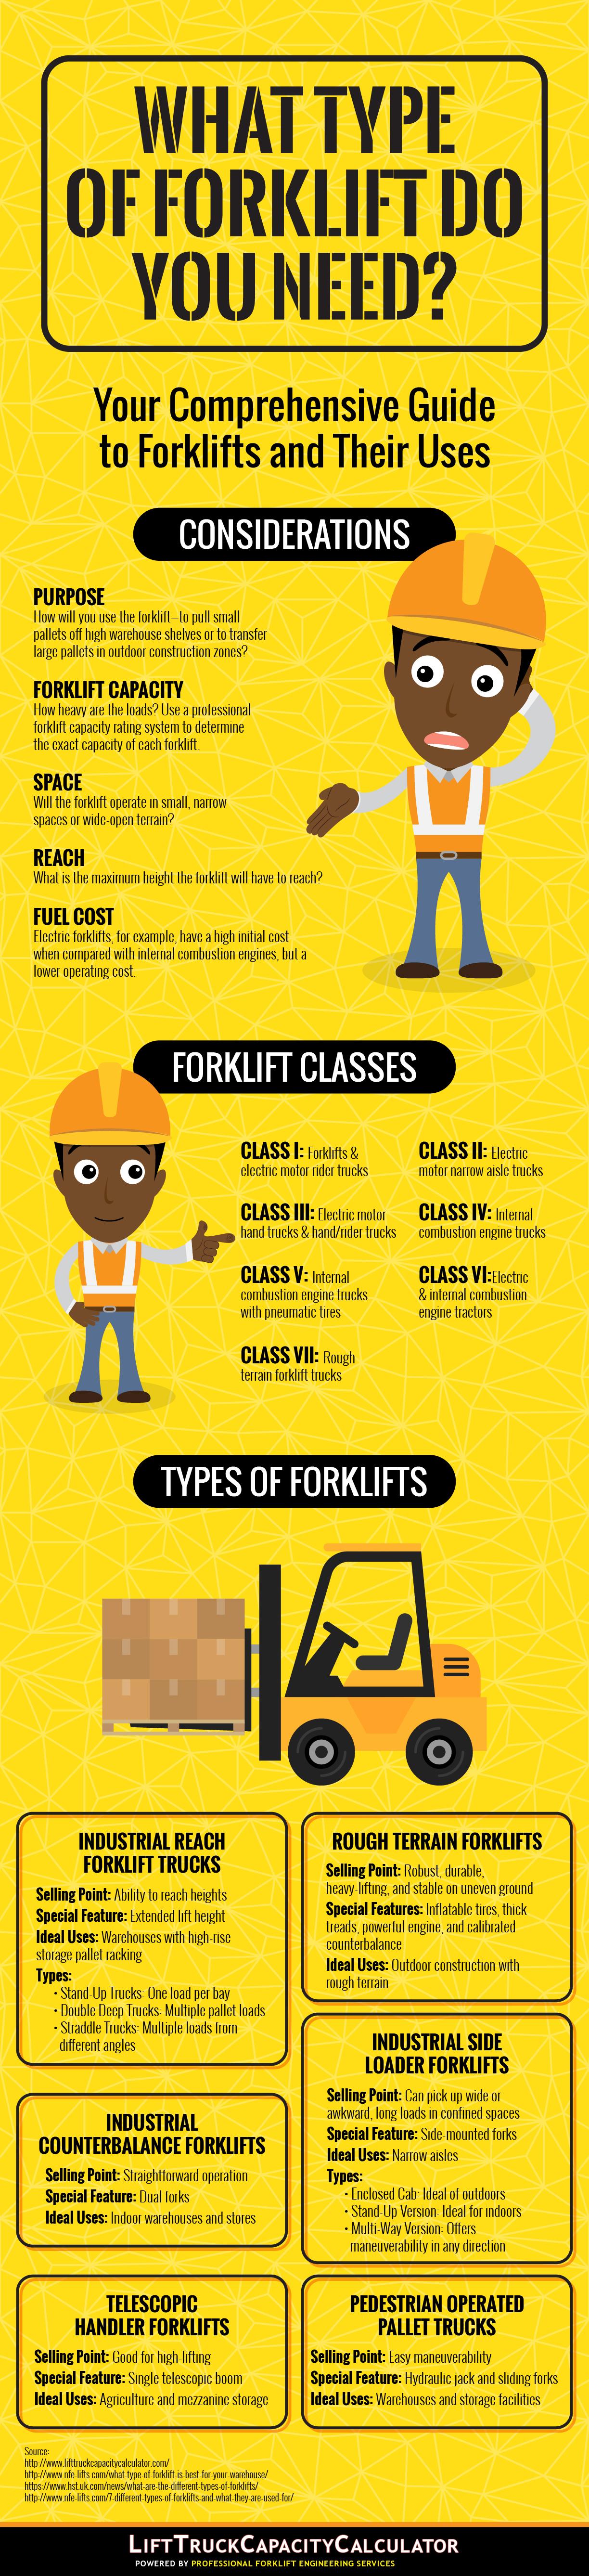 forklift classes lifttruckcapacitycalculator